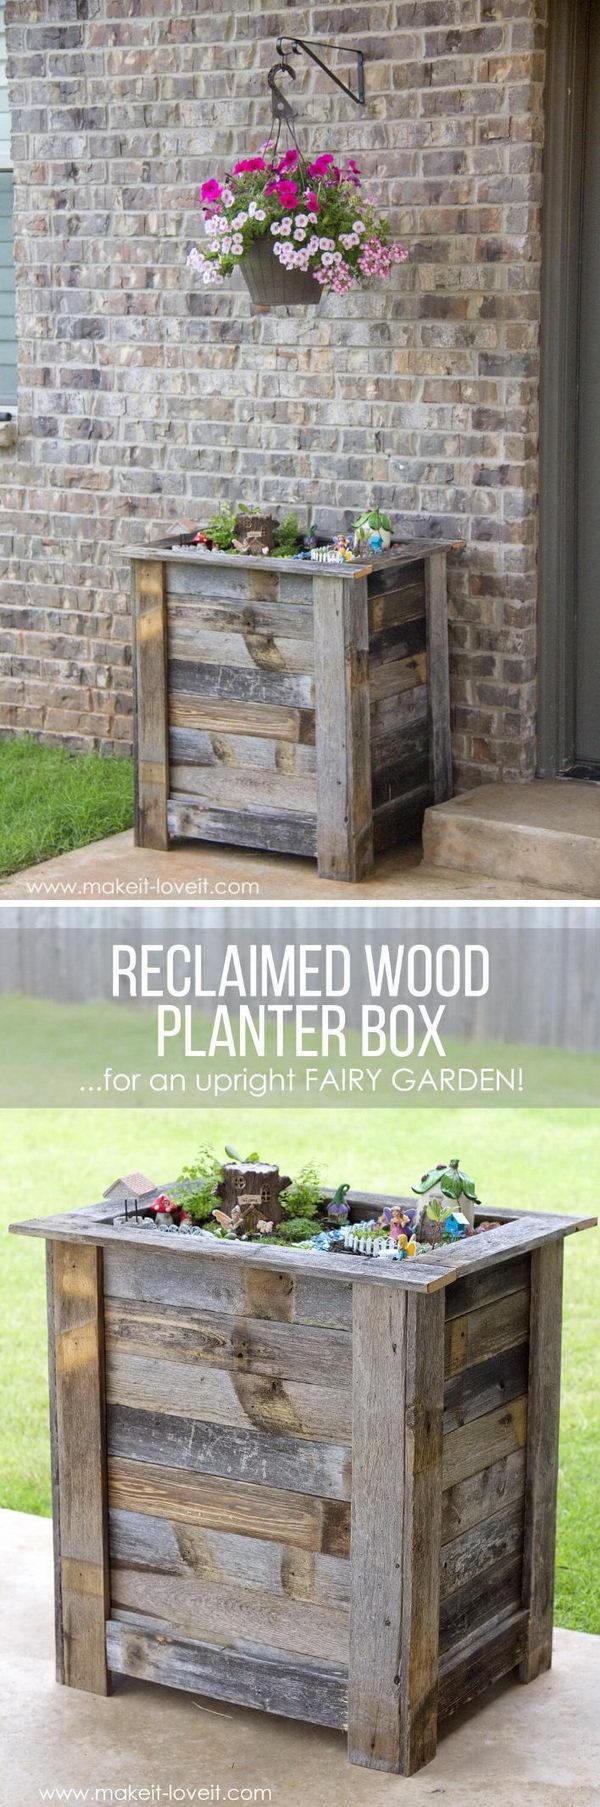 DIY Reclaimed Wood Planter Box for a Fairy Garden.